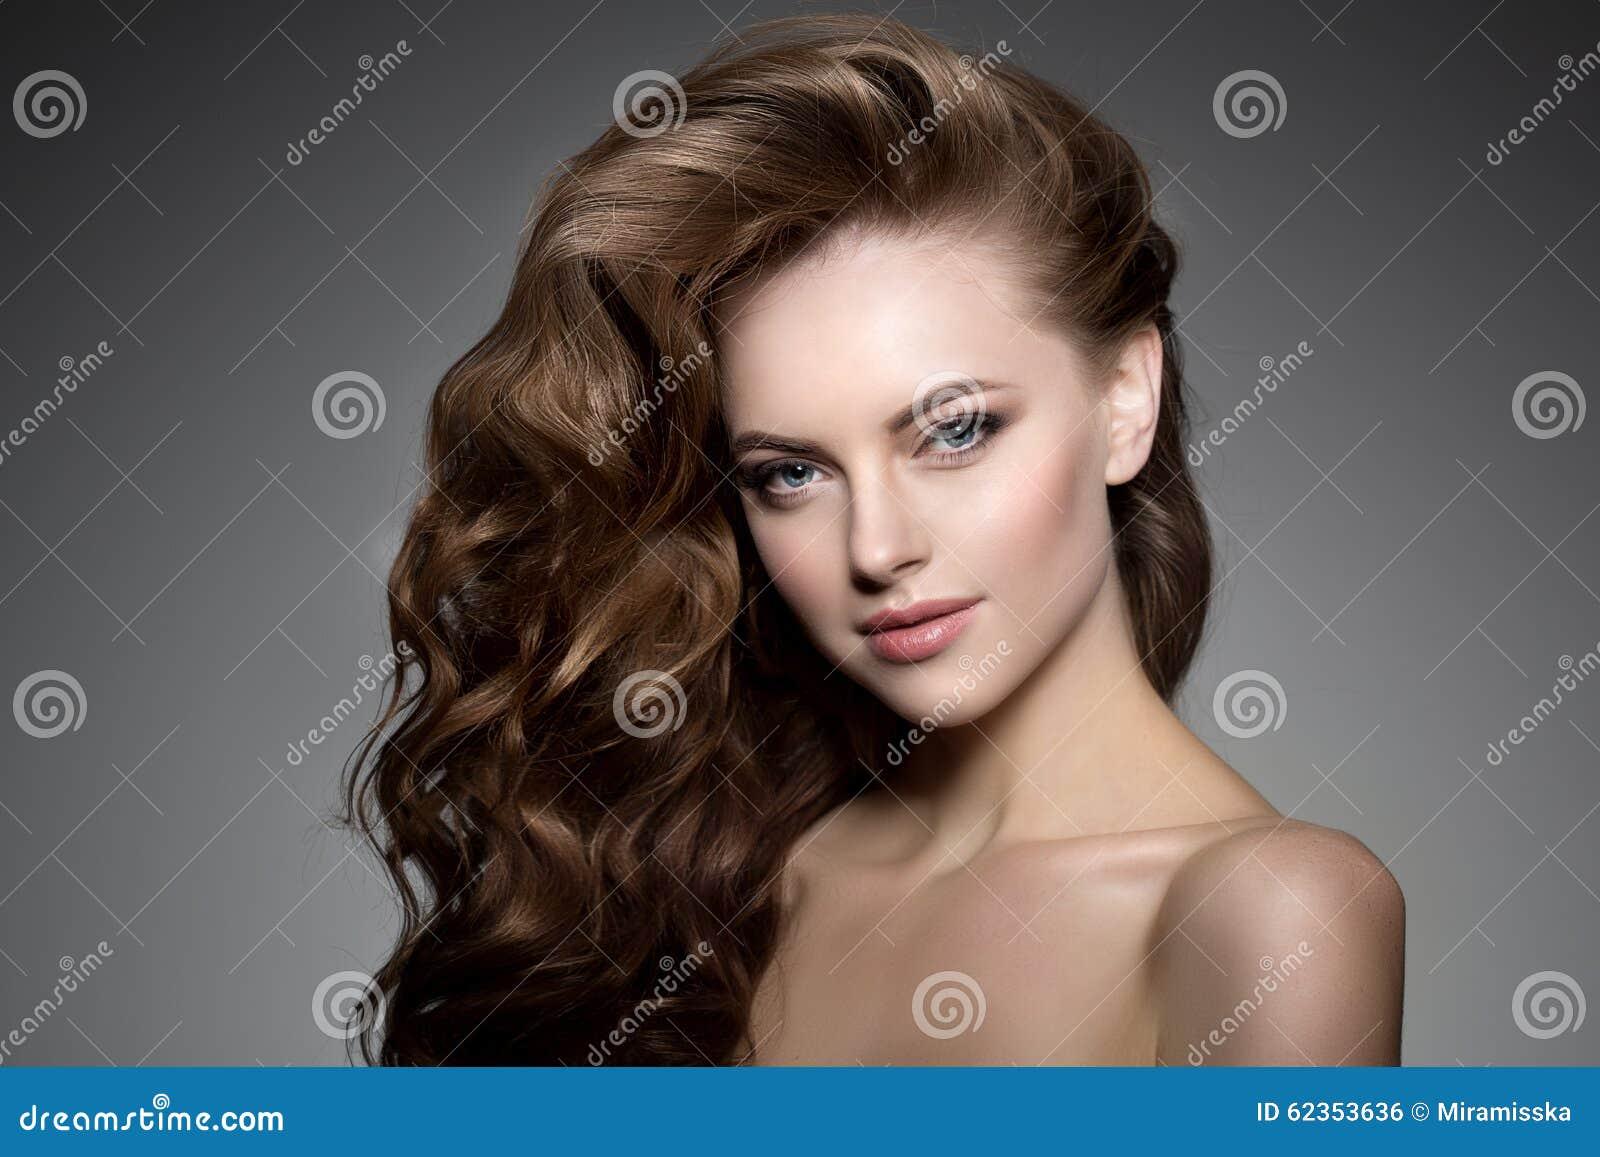 Baumuster Mit Dem Langen Haar Wellen Locken Frisur Schonheits Frau